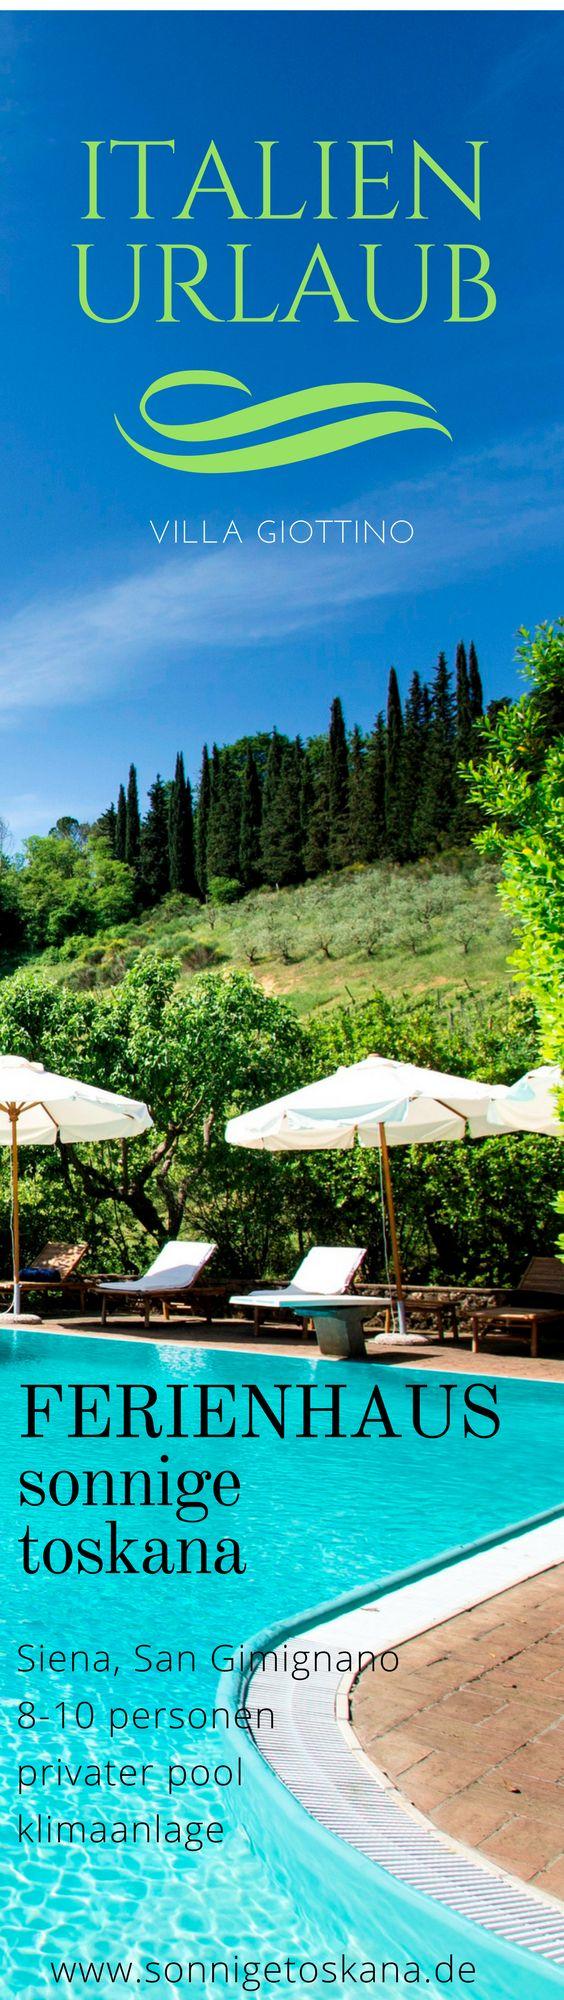 Villa Giottino Villa, Italien, Toskana, Provinz Siena, San Gimignano, 8-10 Personen, Privater Pool, Klimaanlage